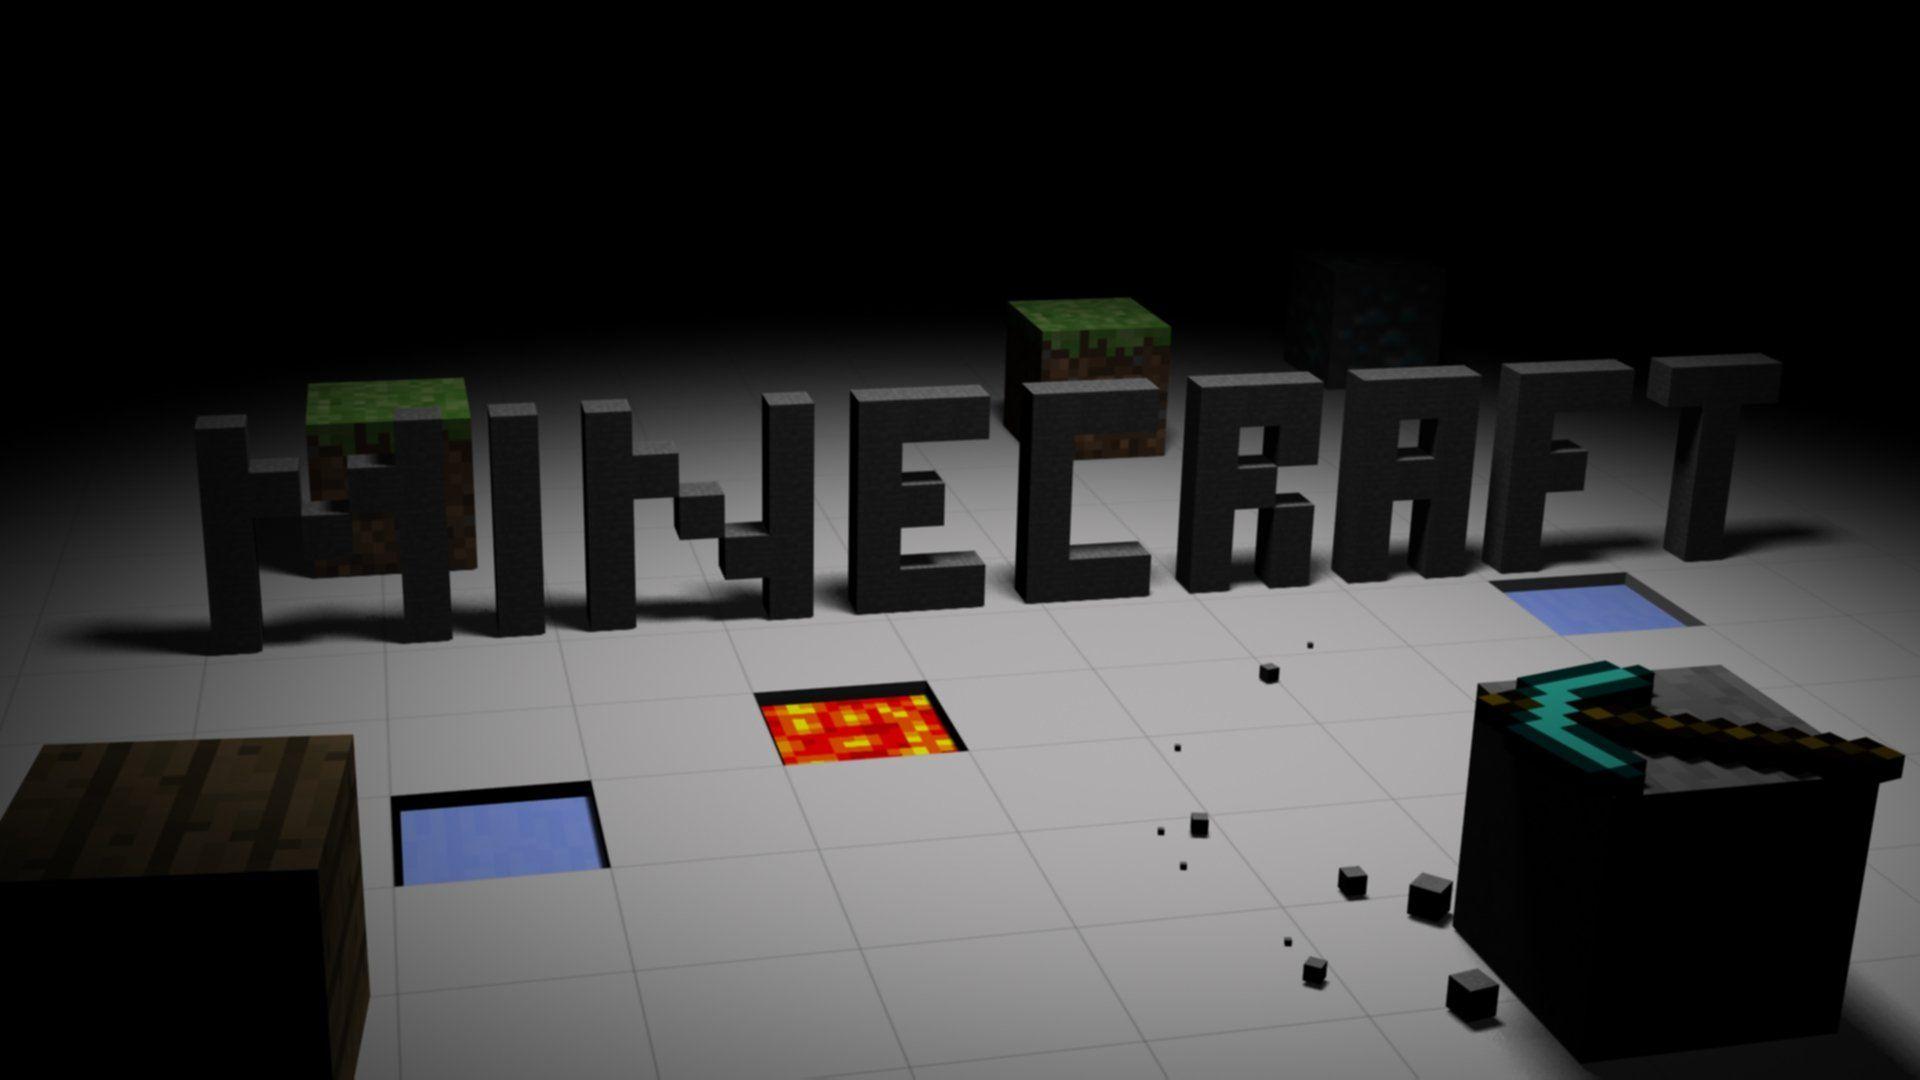 Popular Wallpaper Minecraft Laptop - 6150b151ffae26f81a776619dcdbb689  Photograph_591329.jpg